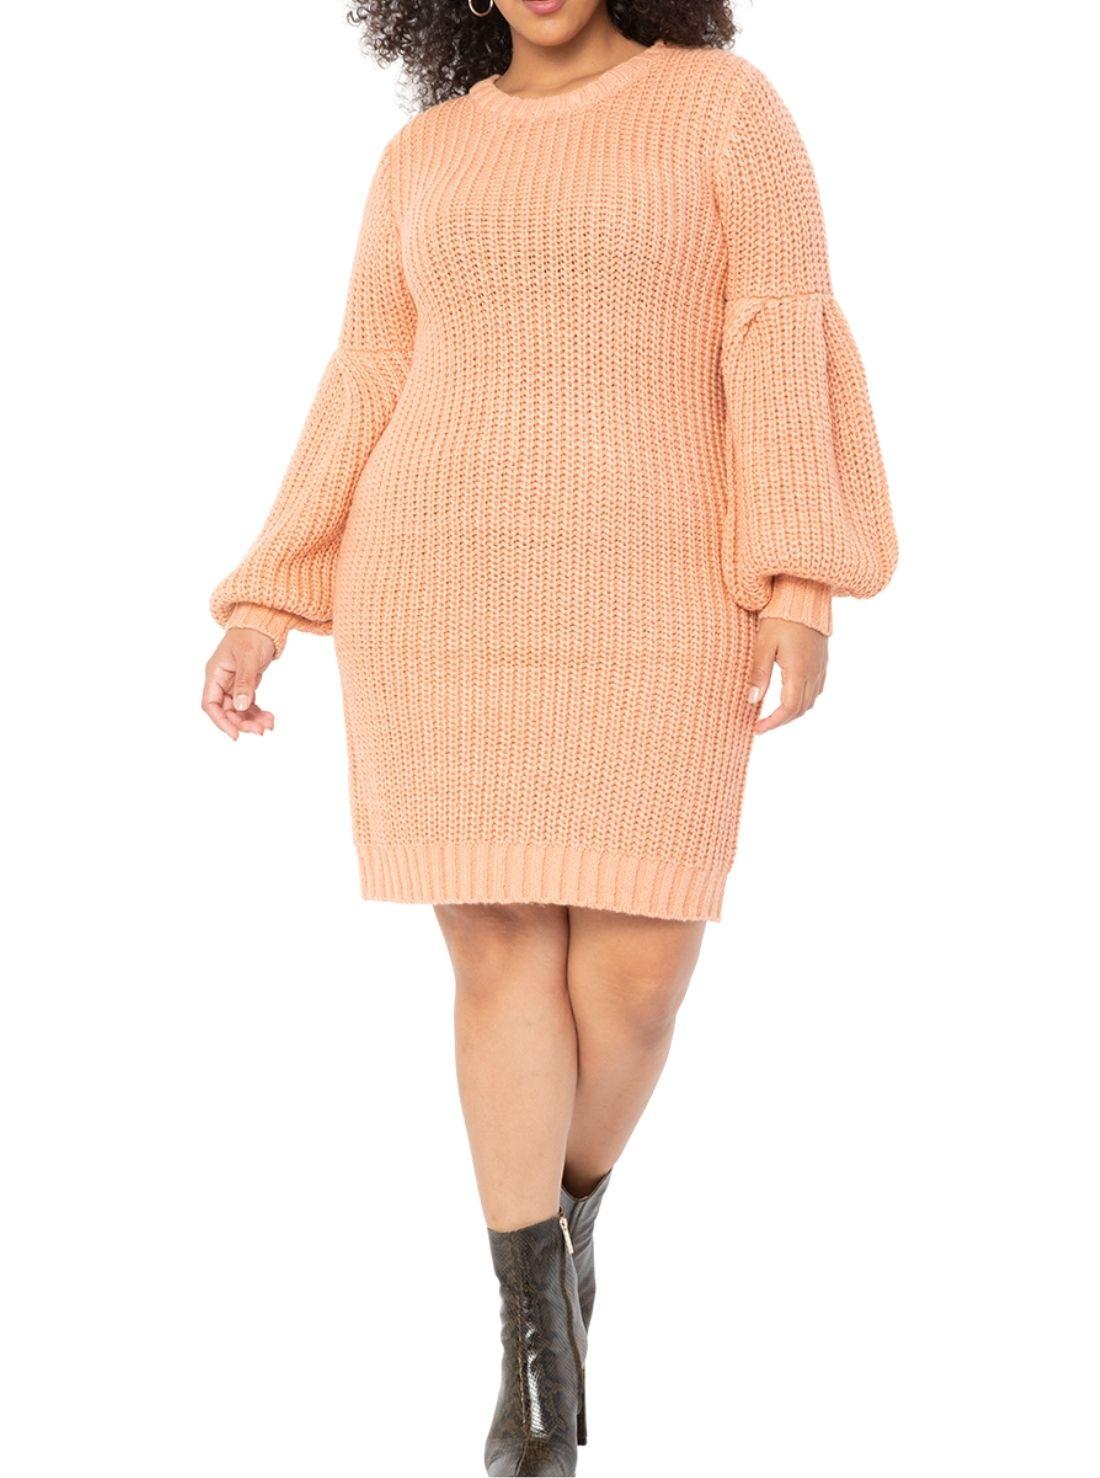 Plus Size Wholesale Sweater Dresses